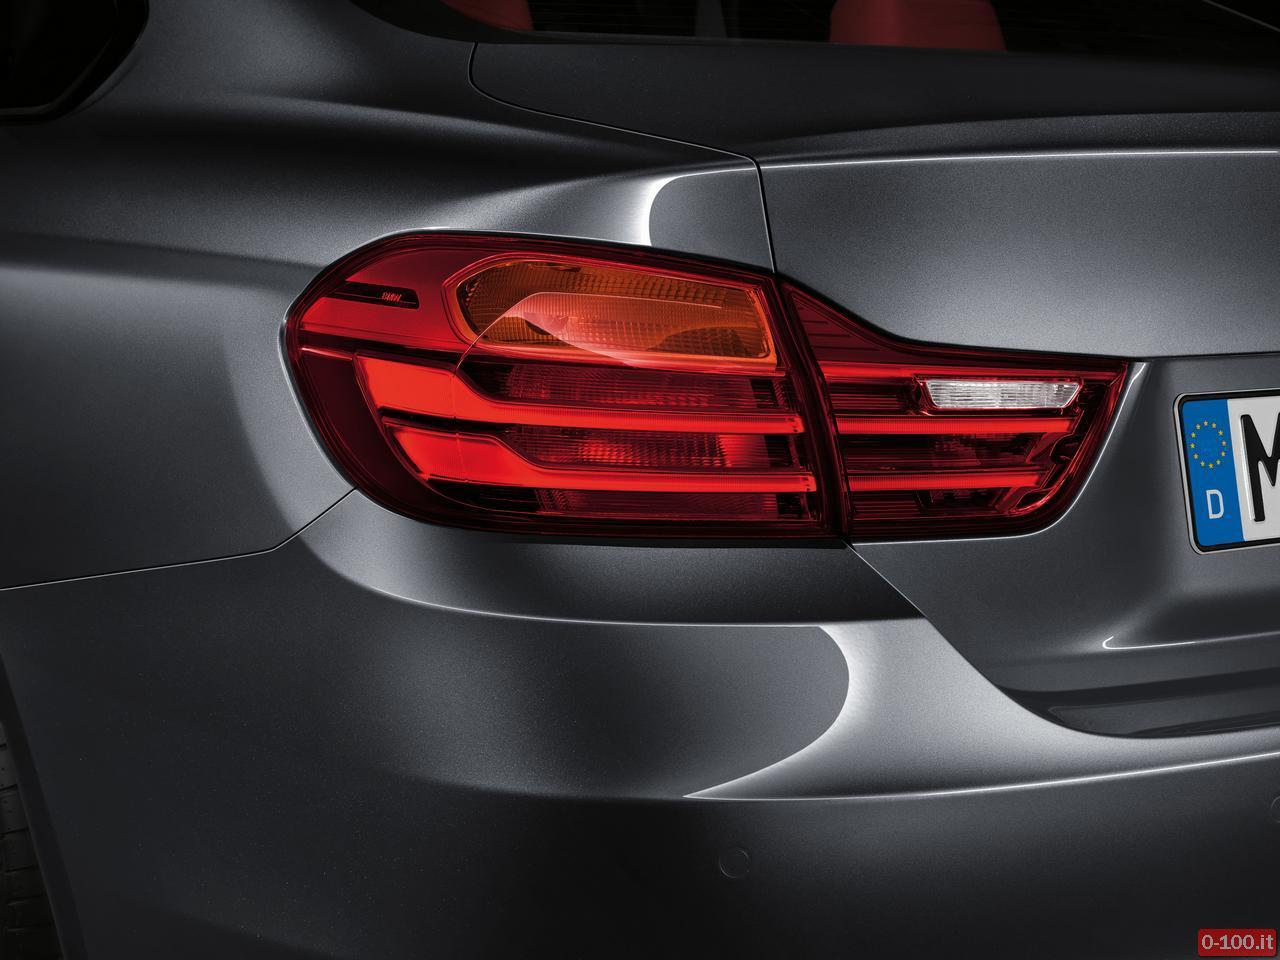 bmw_serie-4-coupé_0-100_79